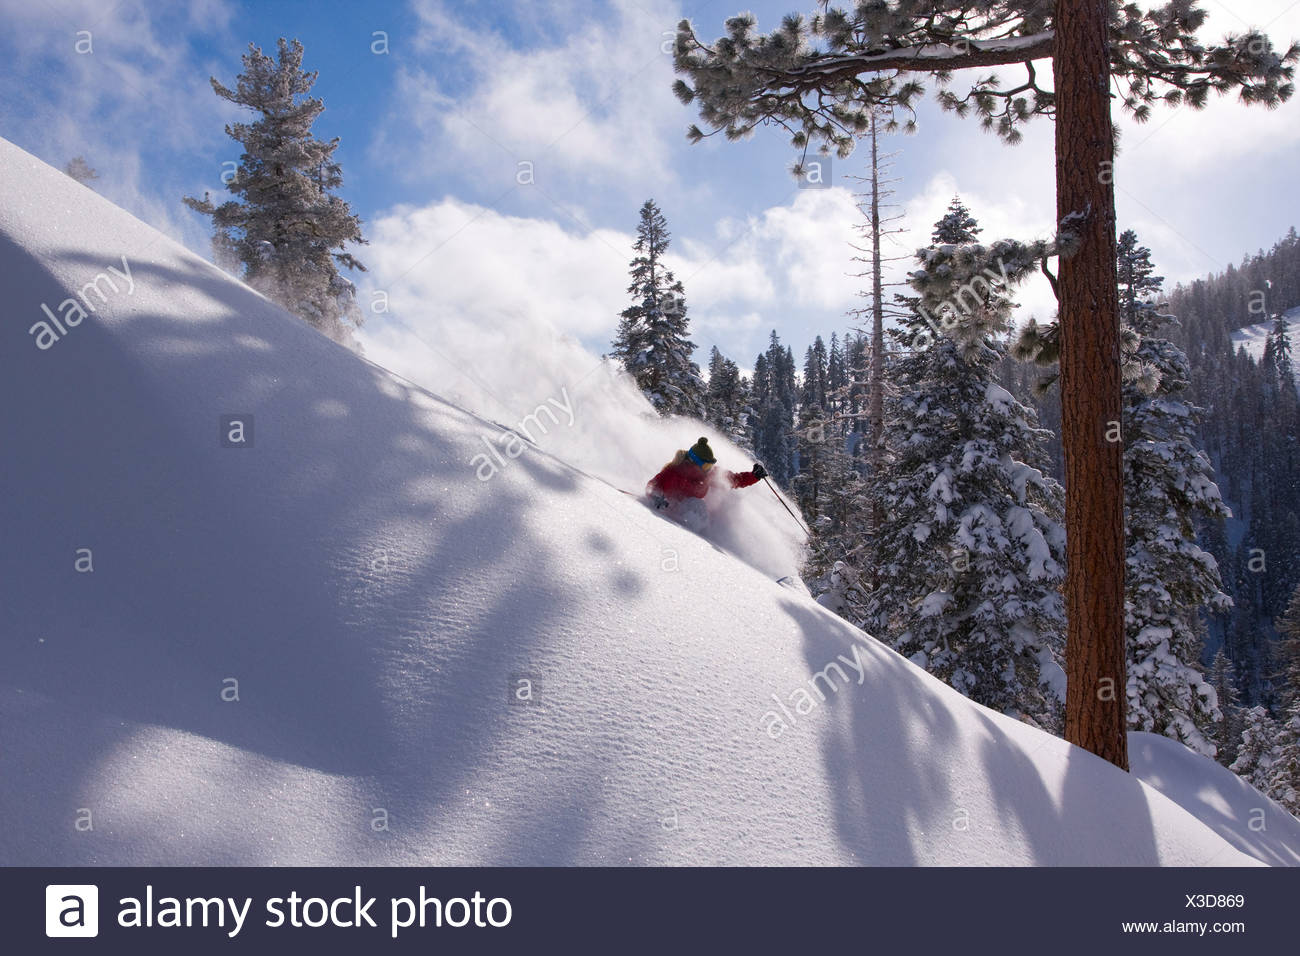 A woman skiing powder snow at Northstar at Tahoe ski area near Lake Tahoe in California Stock Photo